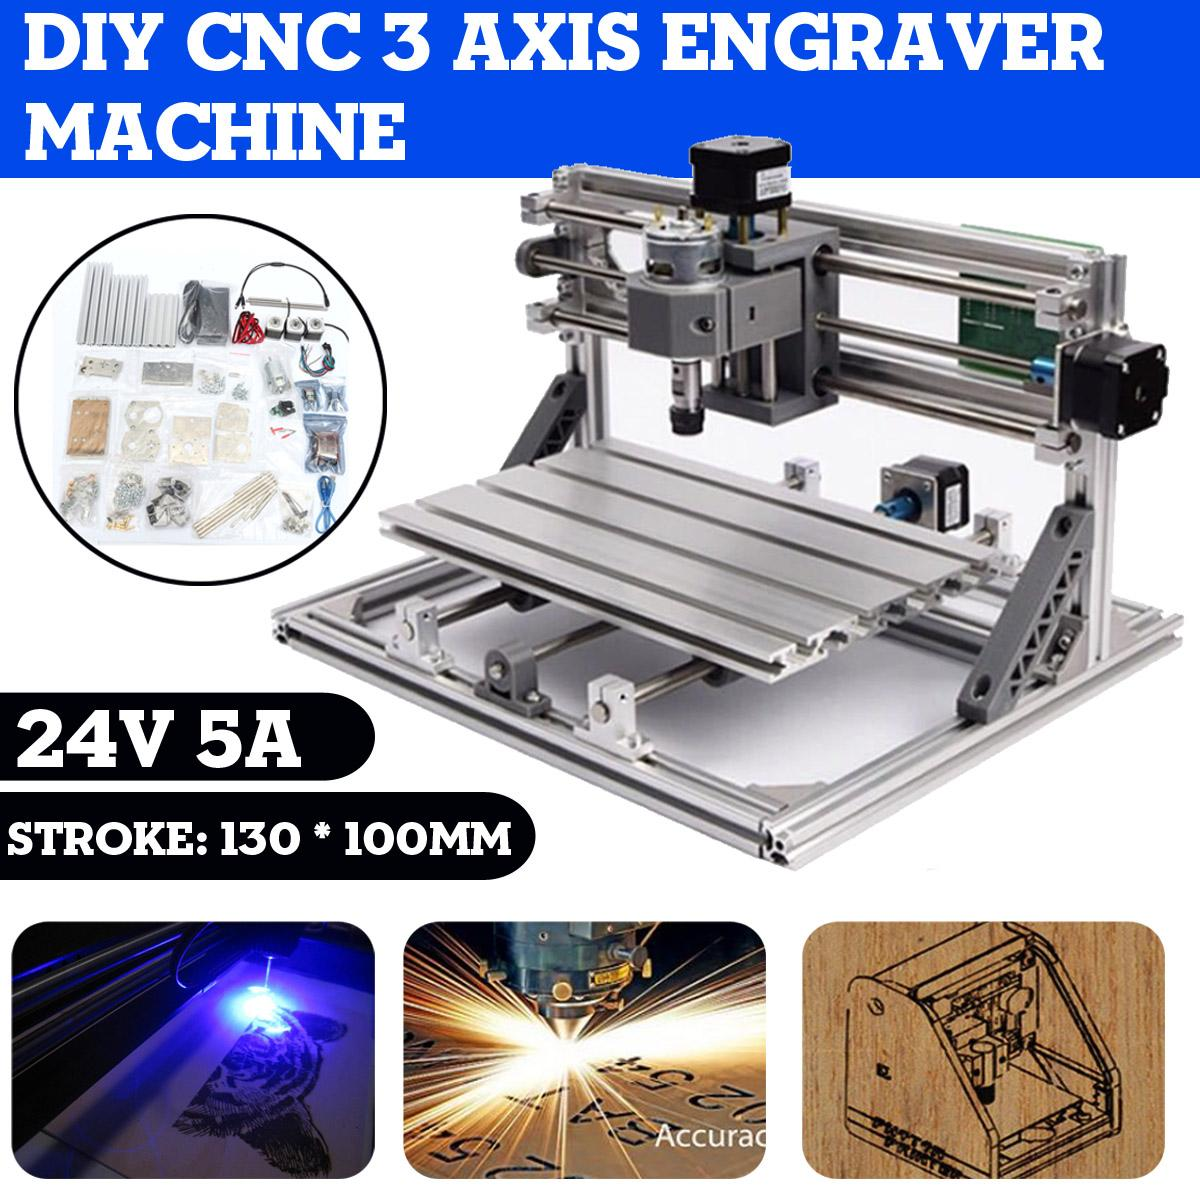 DIY CNC Router Stecher 3 Achsen Engraver Maschine PCB Fräsen Holz Carving Router Laser Gravur Maschine für Grbl Bord